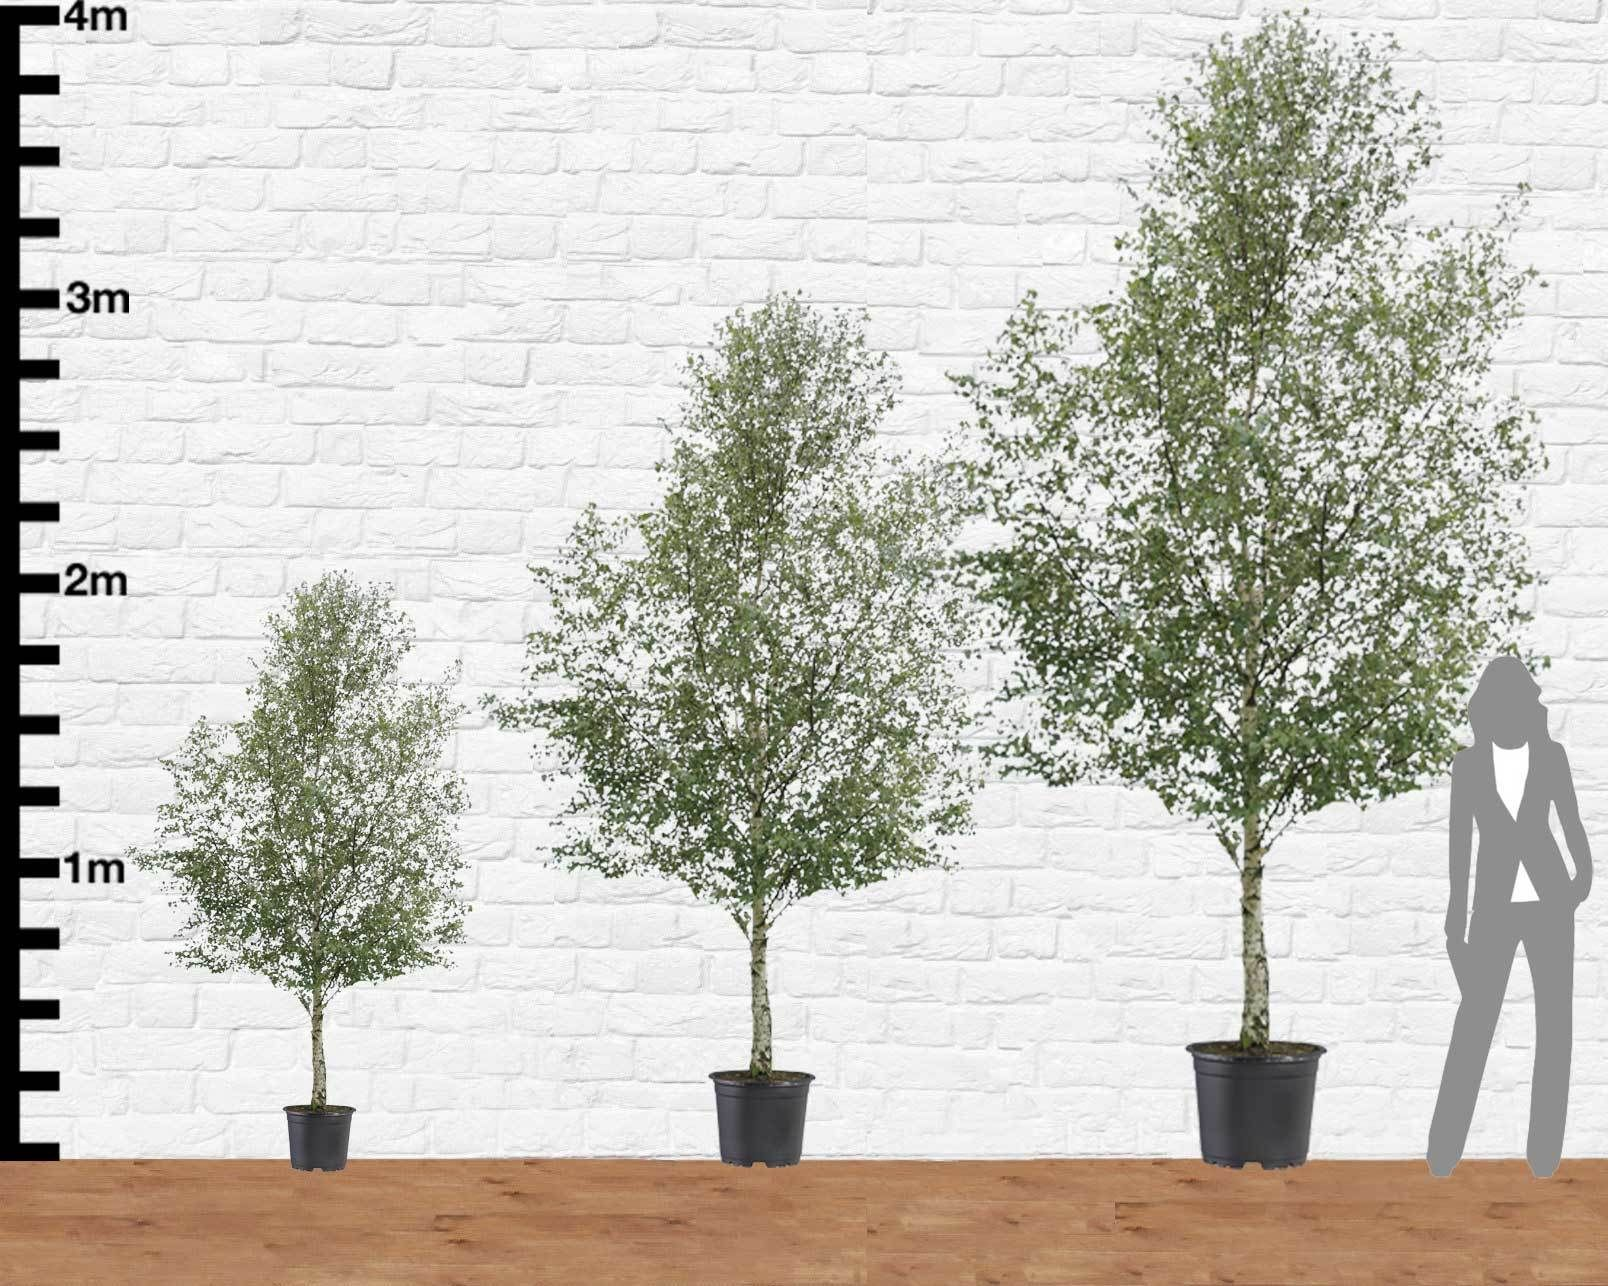 Silver Birch Tree Hire - Supazaar